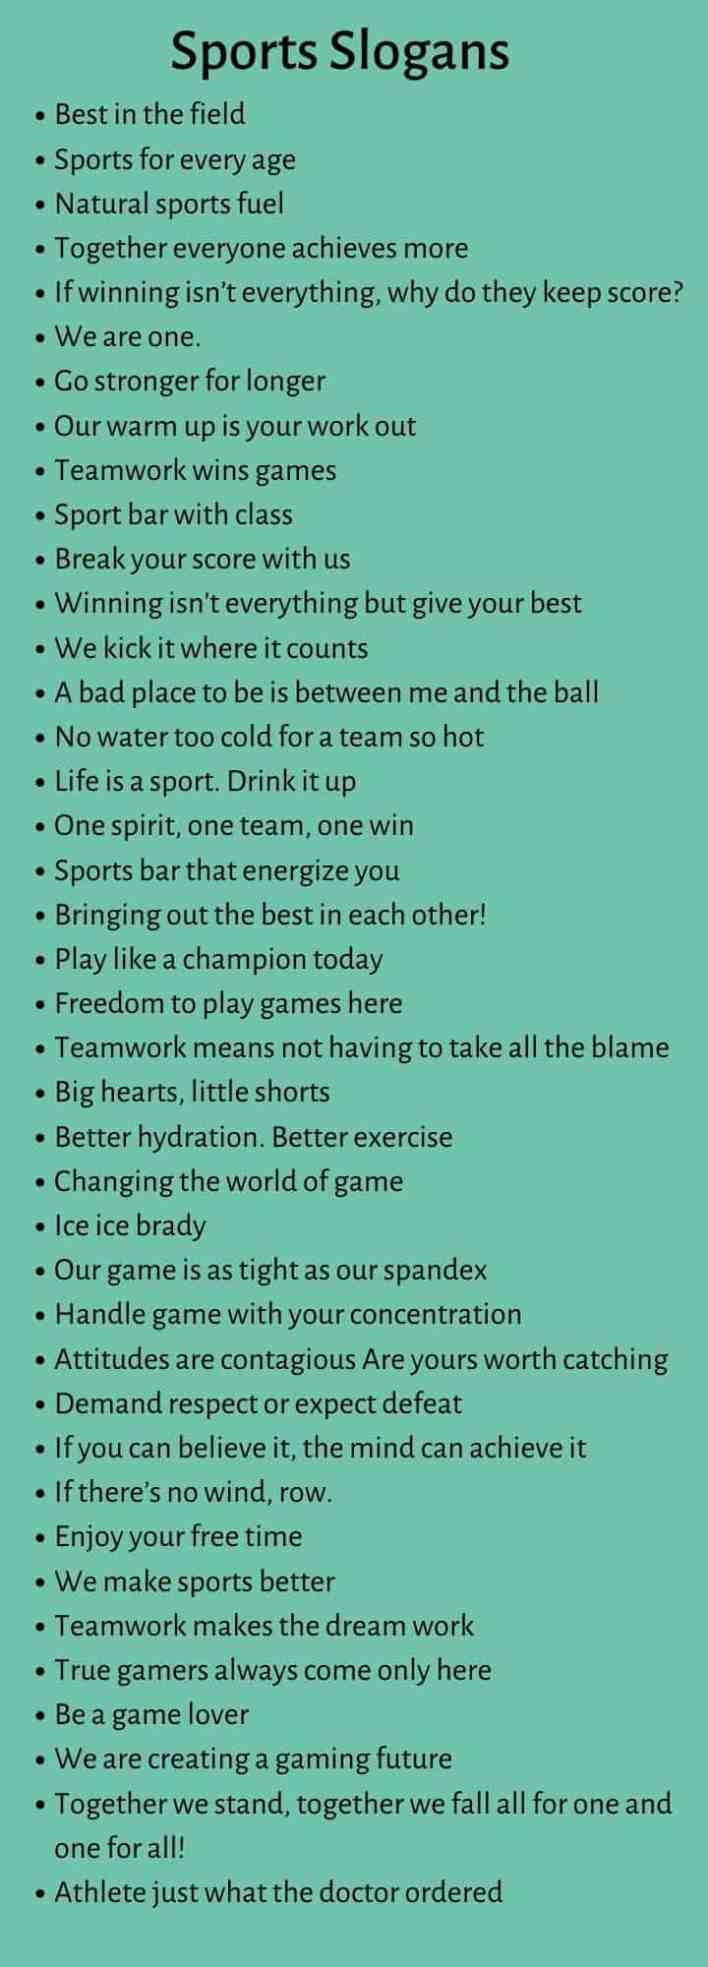 Sports Slogans